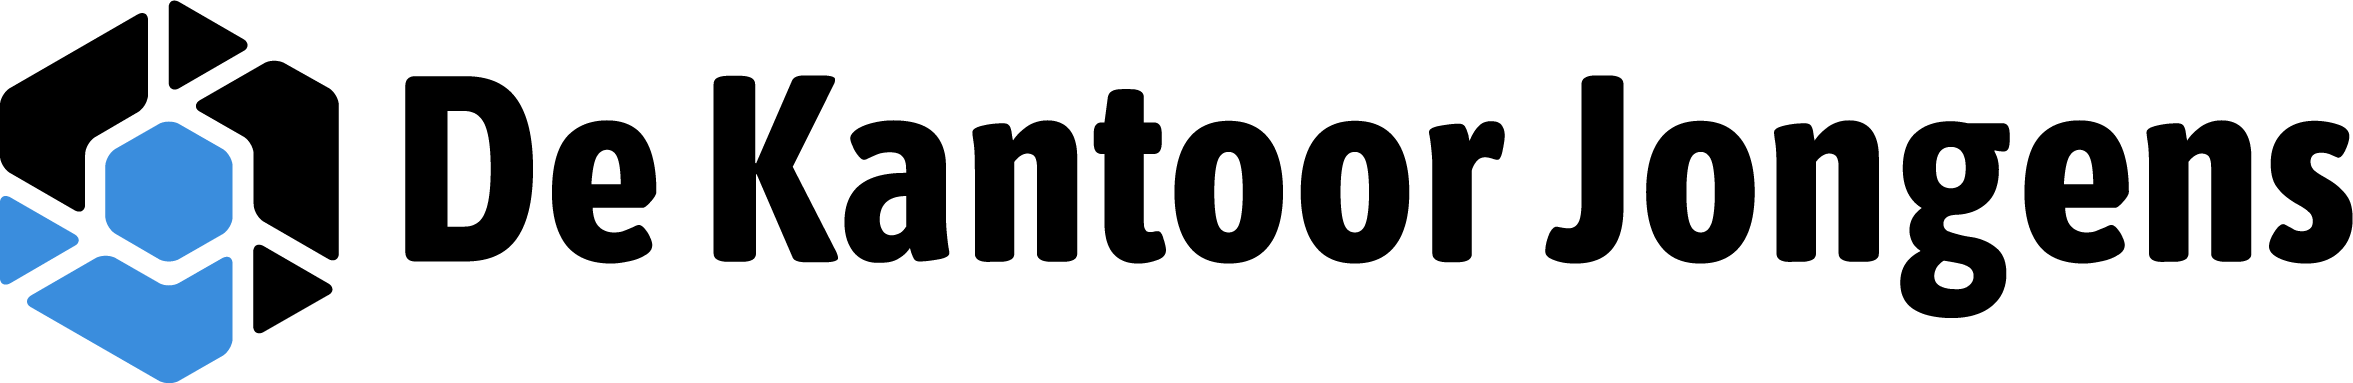 DKJLogoWEB01